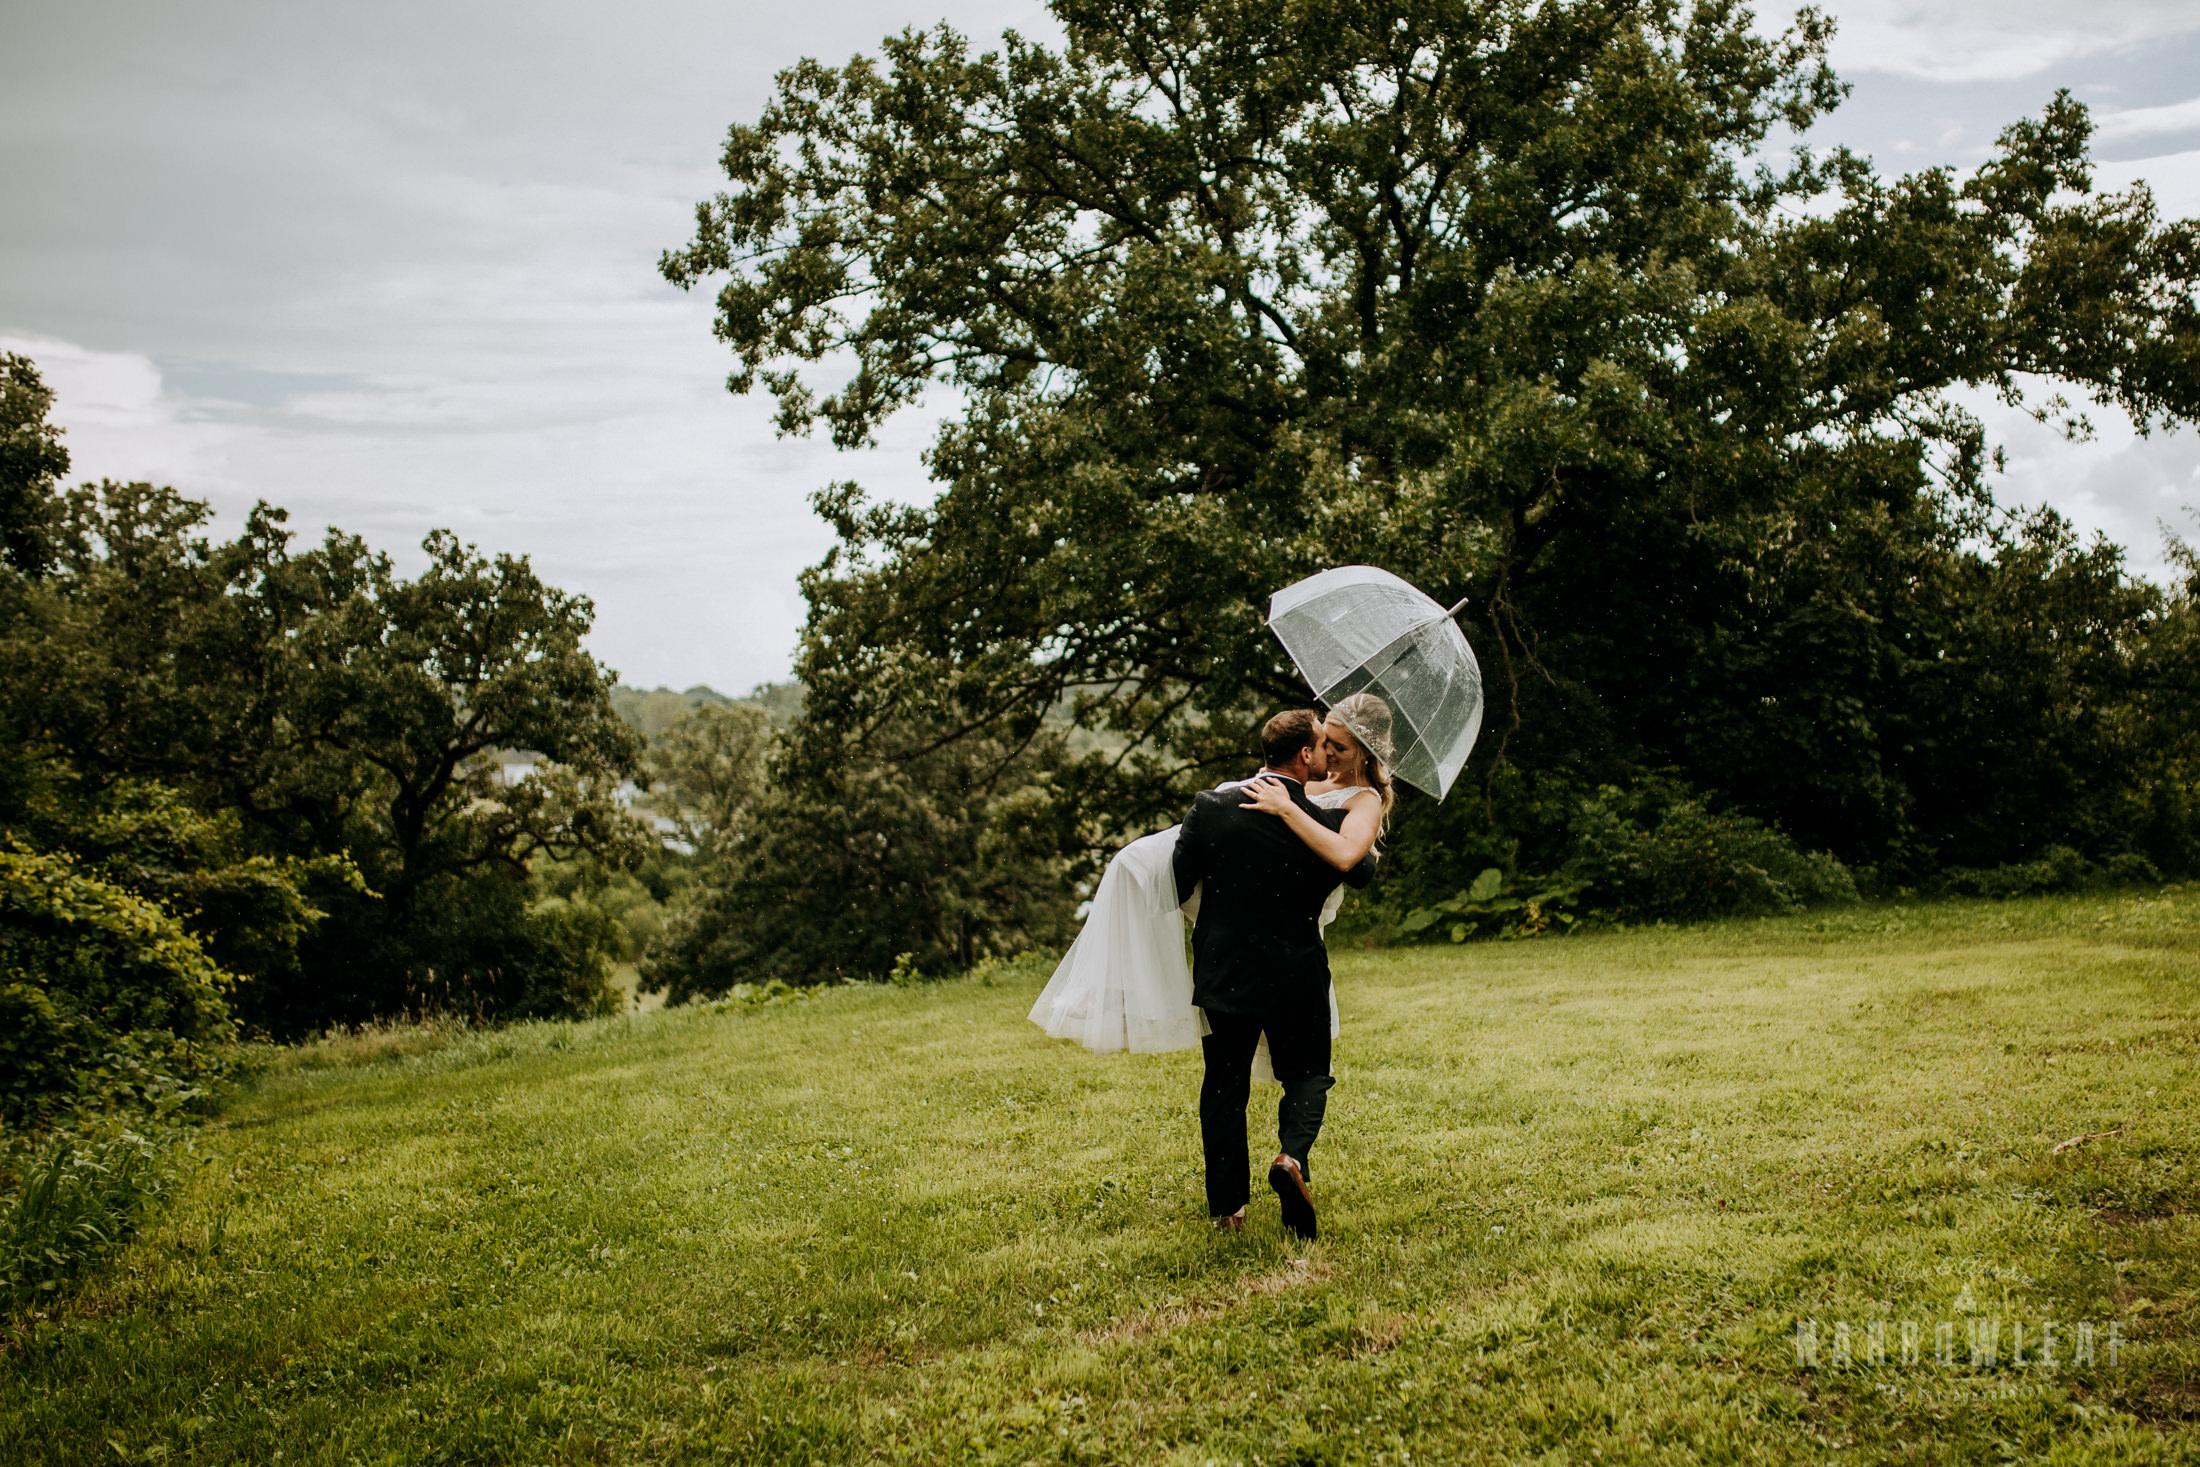 John-P-Furber-Farm-Minnesota-wedding-photographer-Narrowleaf_Love_and_Adventure_Photography-8940.jpg